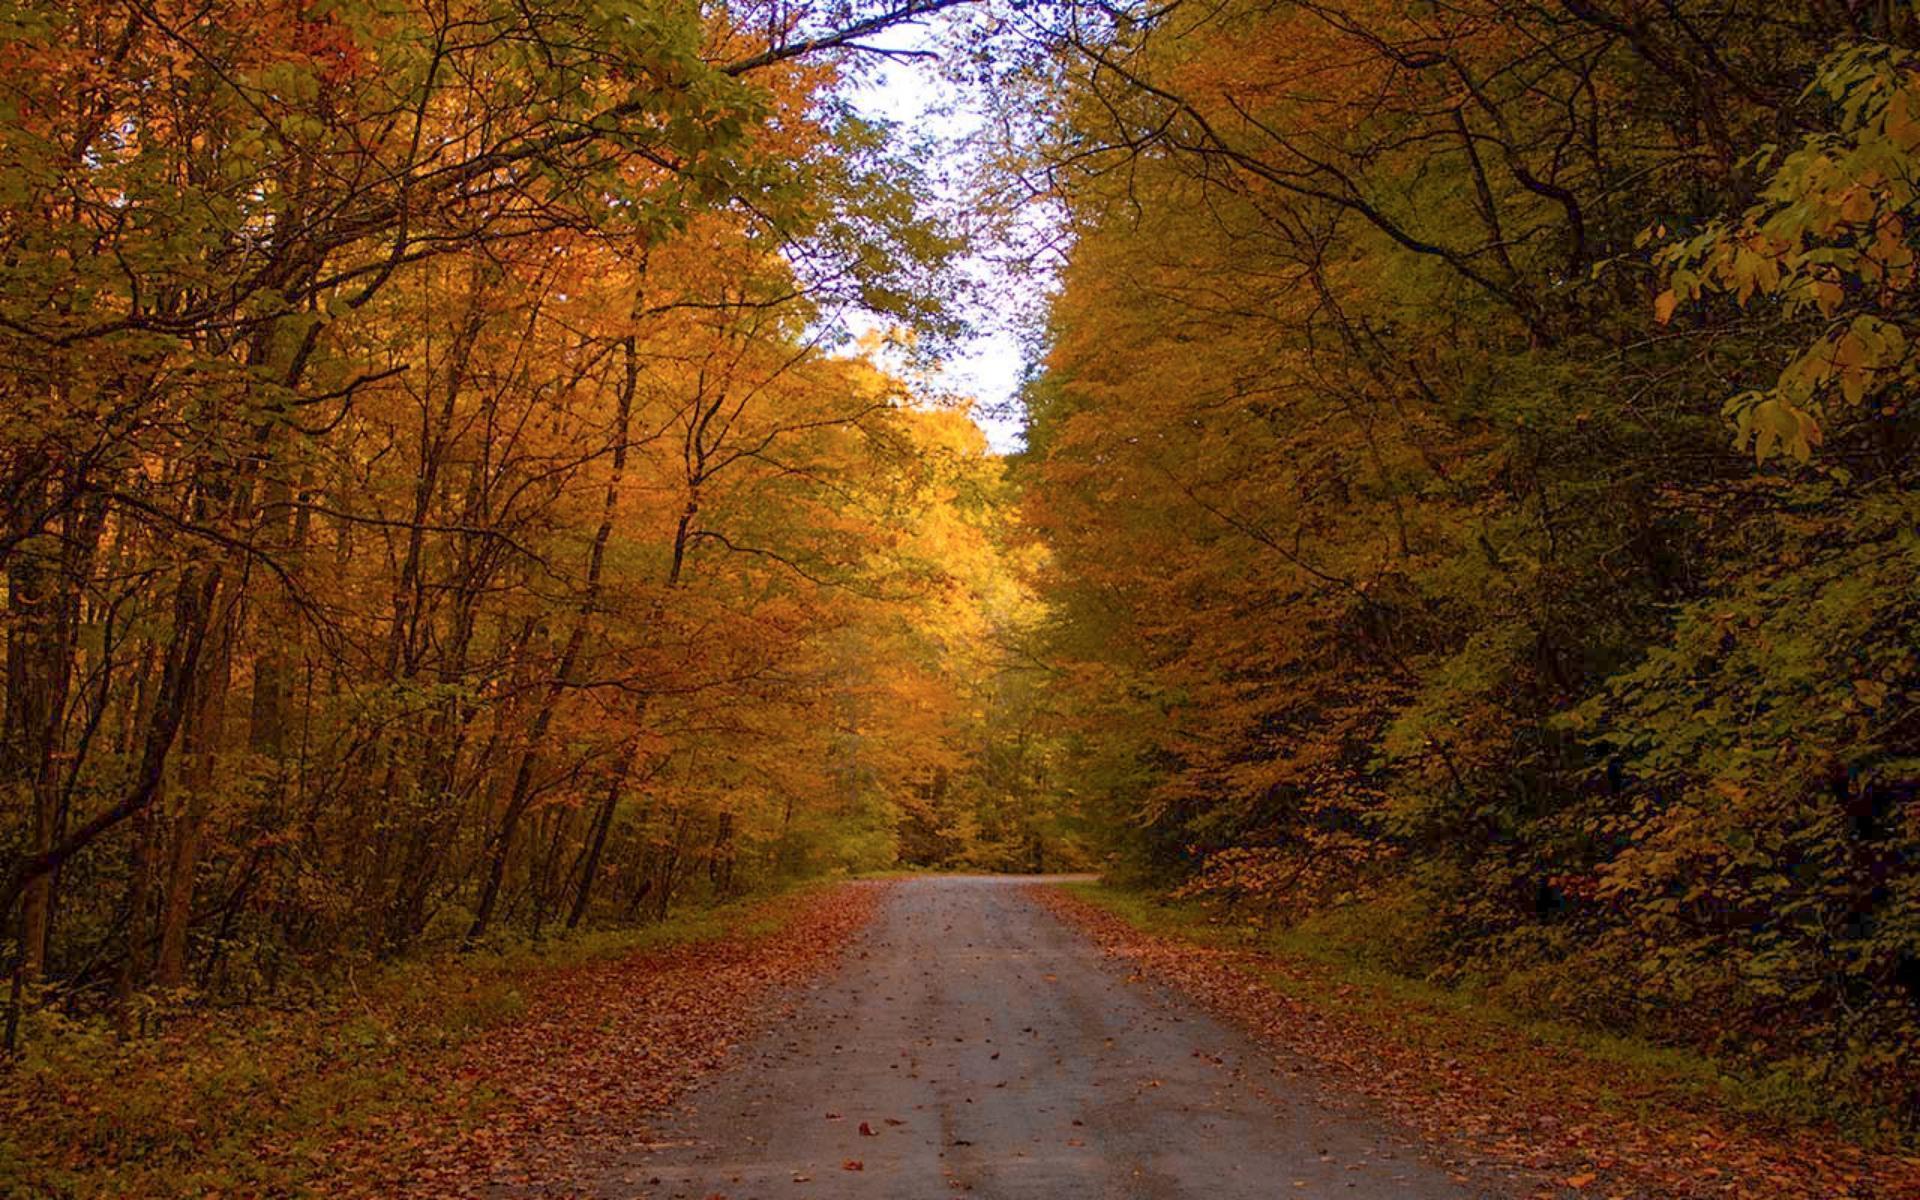 backroads in the fall